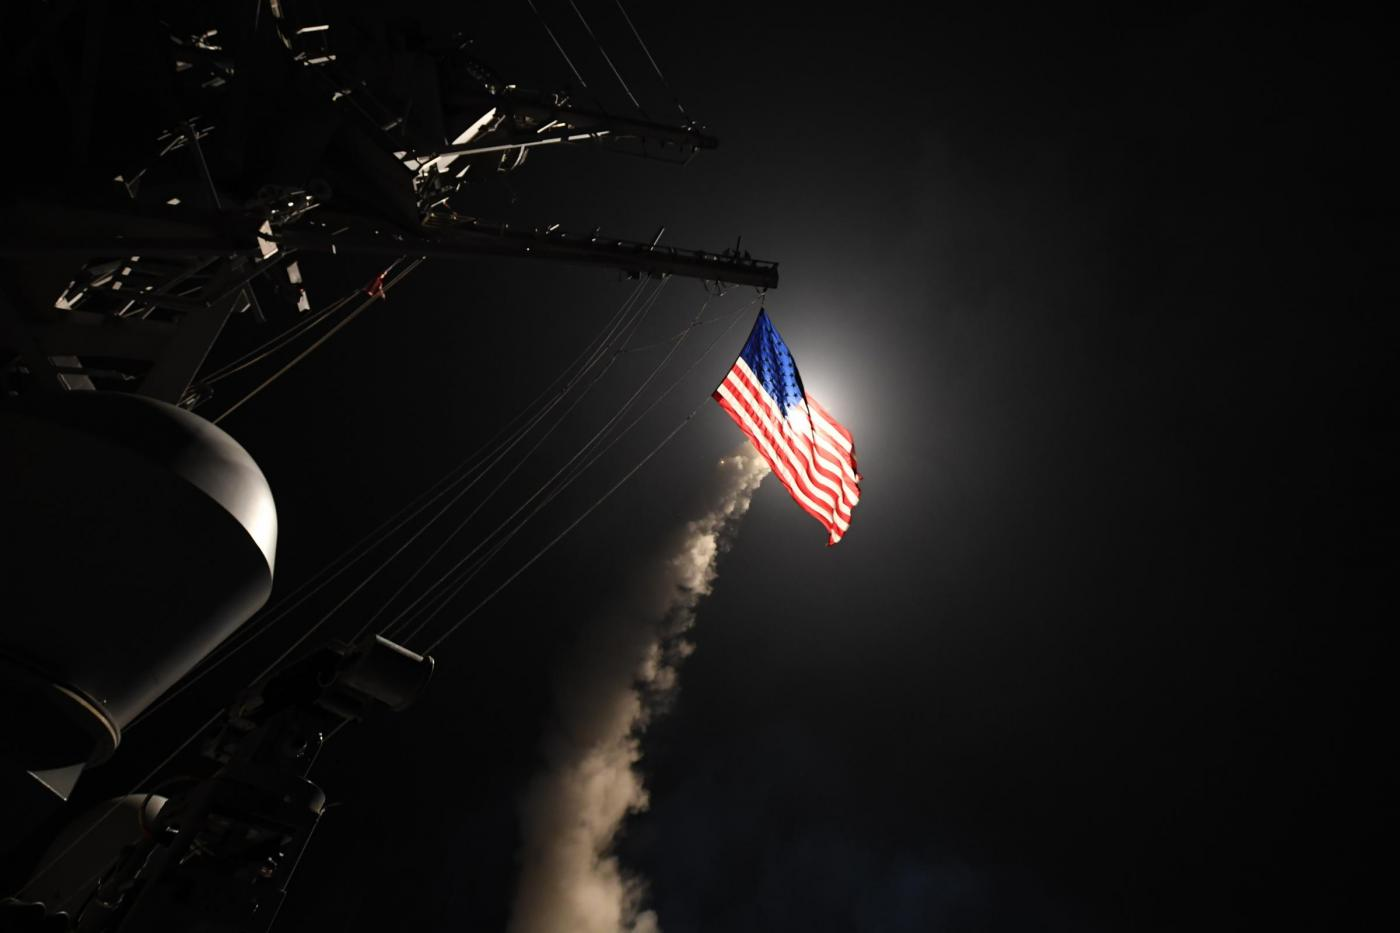 Lancio missili Usa contro base area in Siria